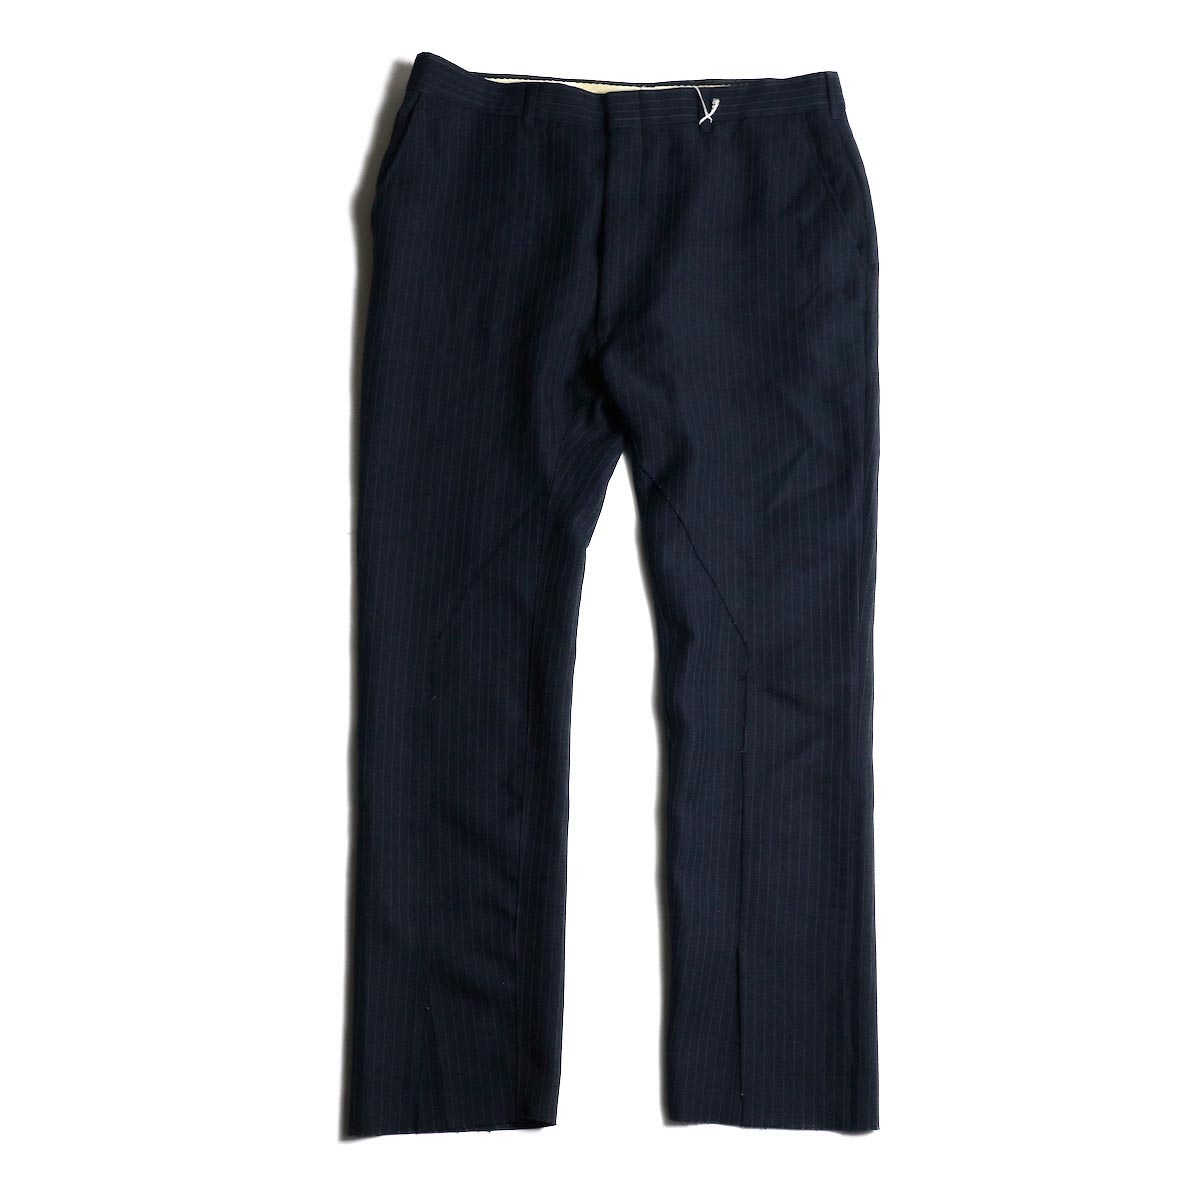 OLD PARK / SLIT PANTS SLACKS (Msize-A)